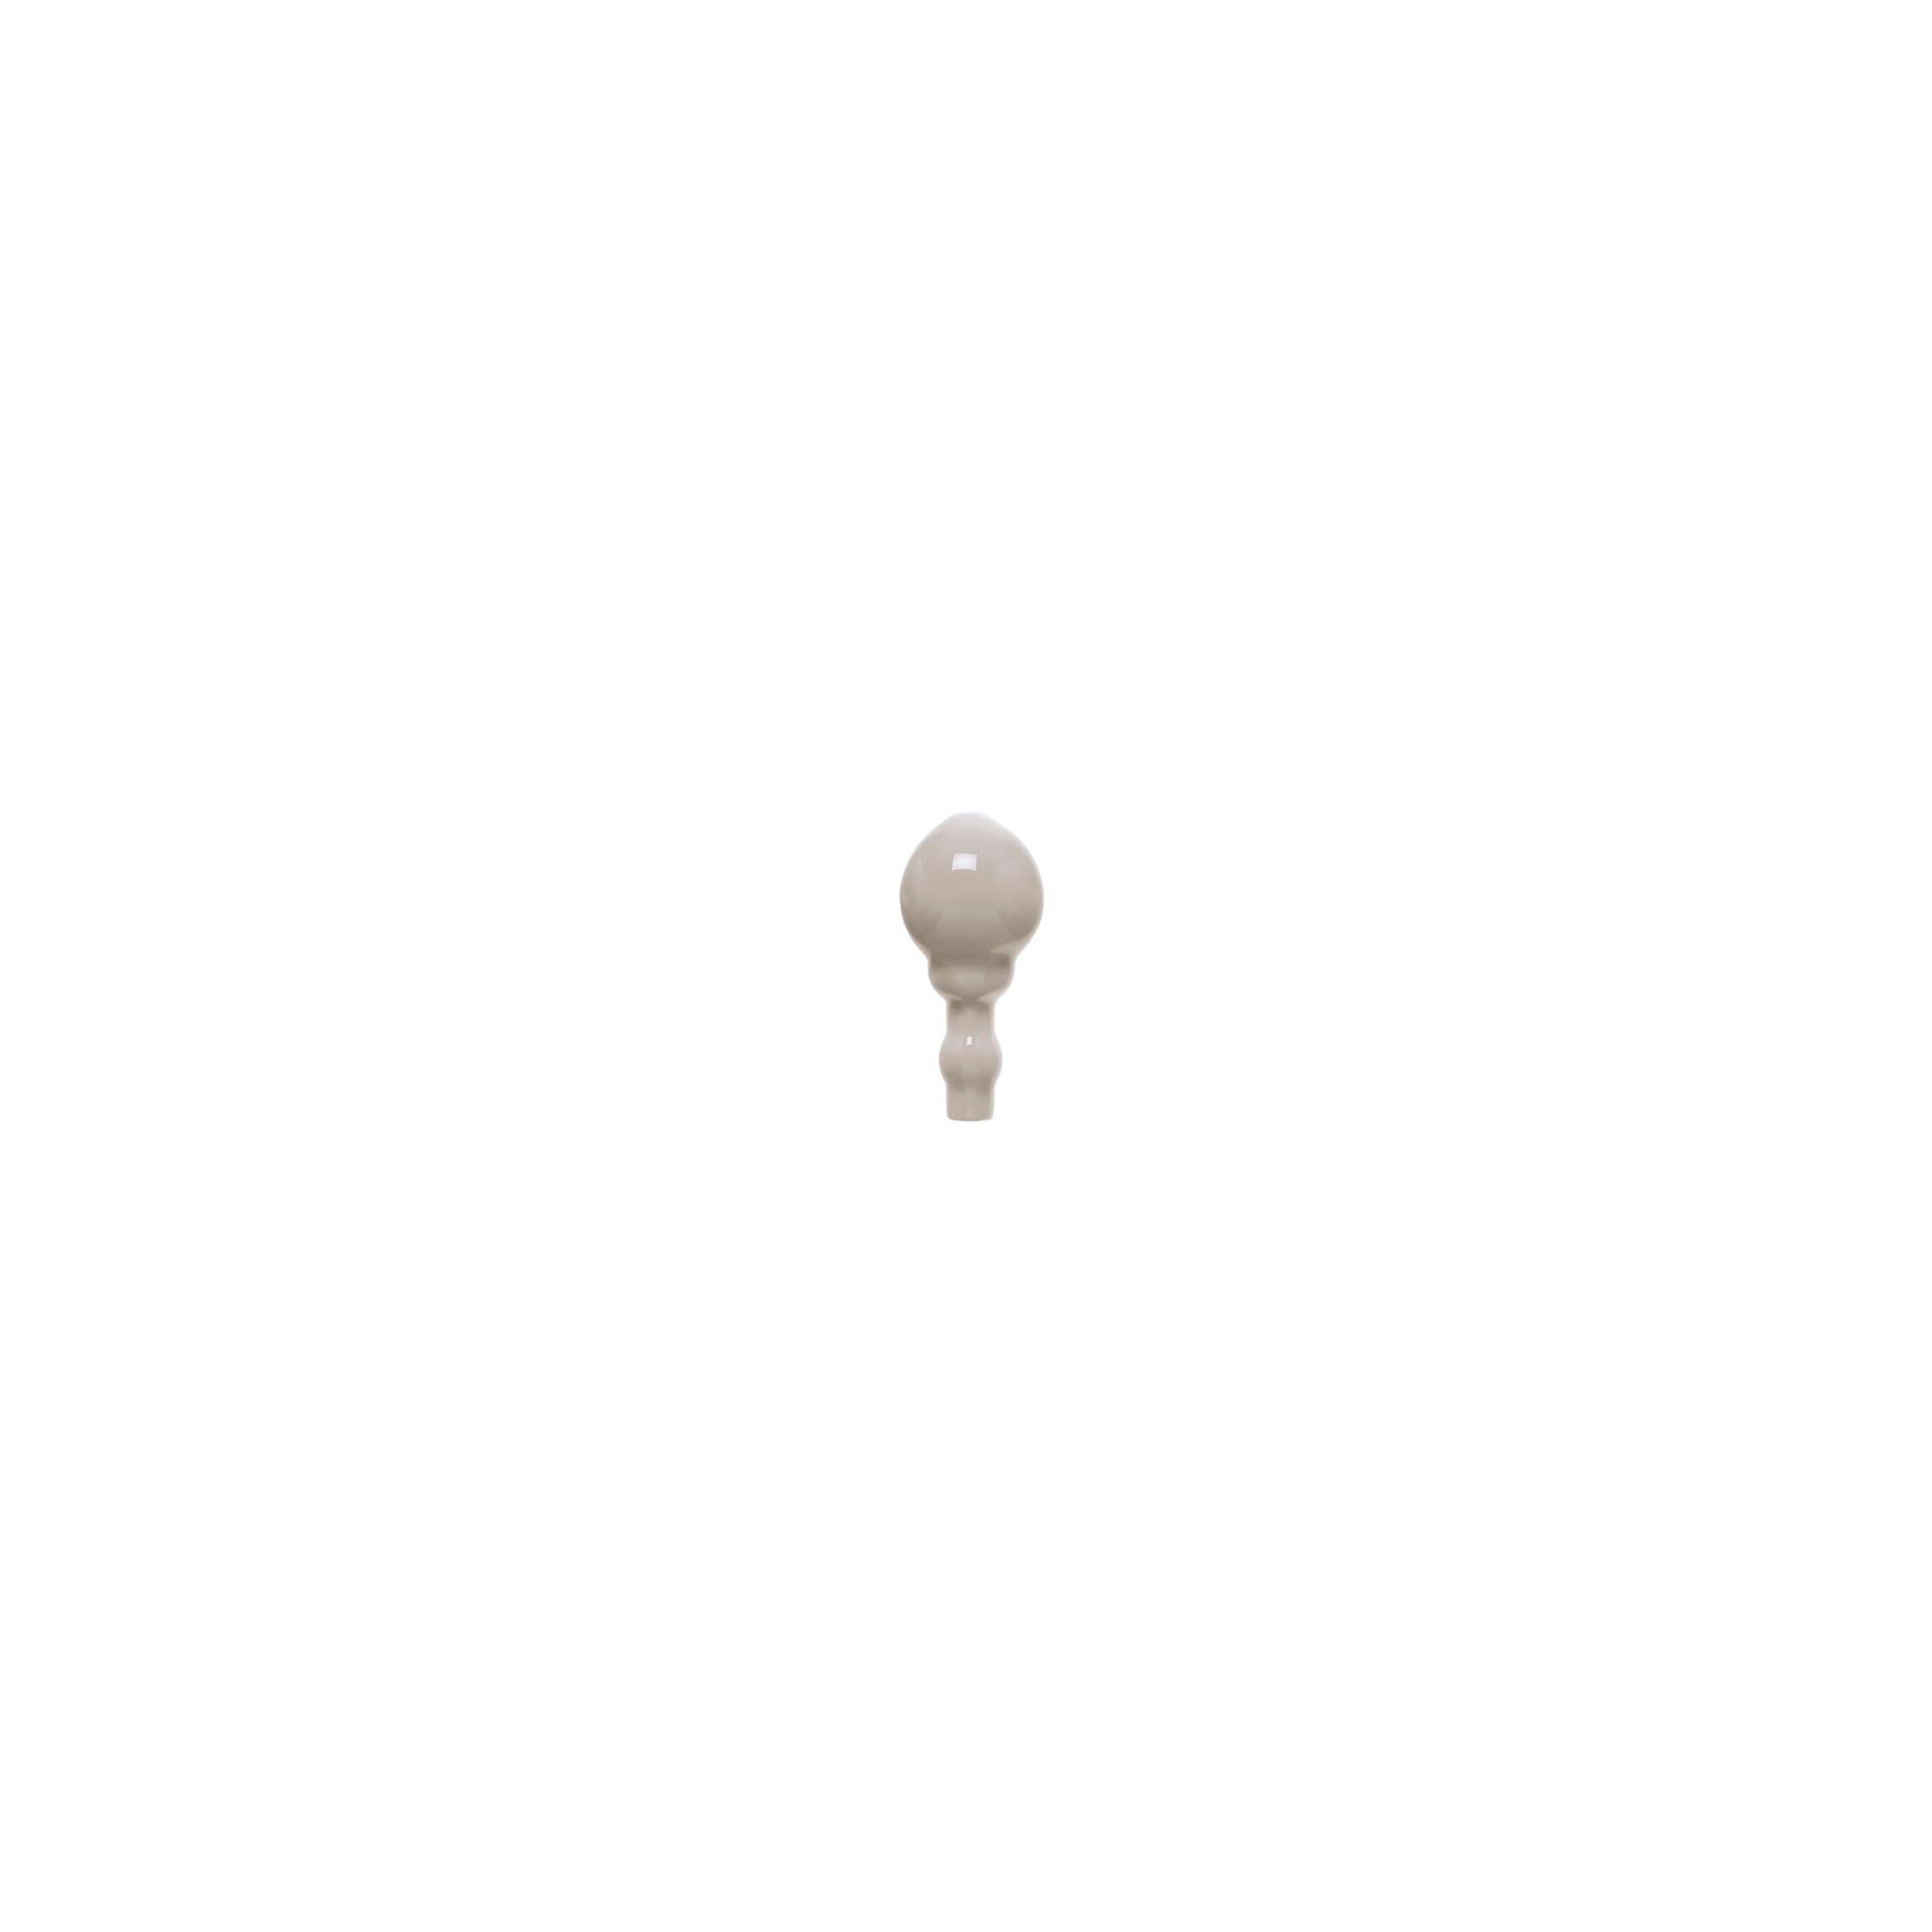 ADNE5509 - ANGULO EXTERIOR MOLDURAITALIANA PB